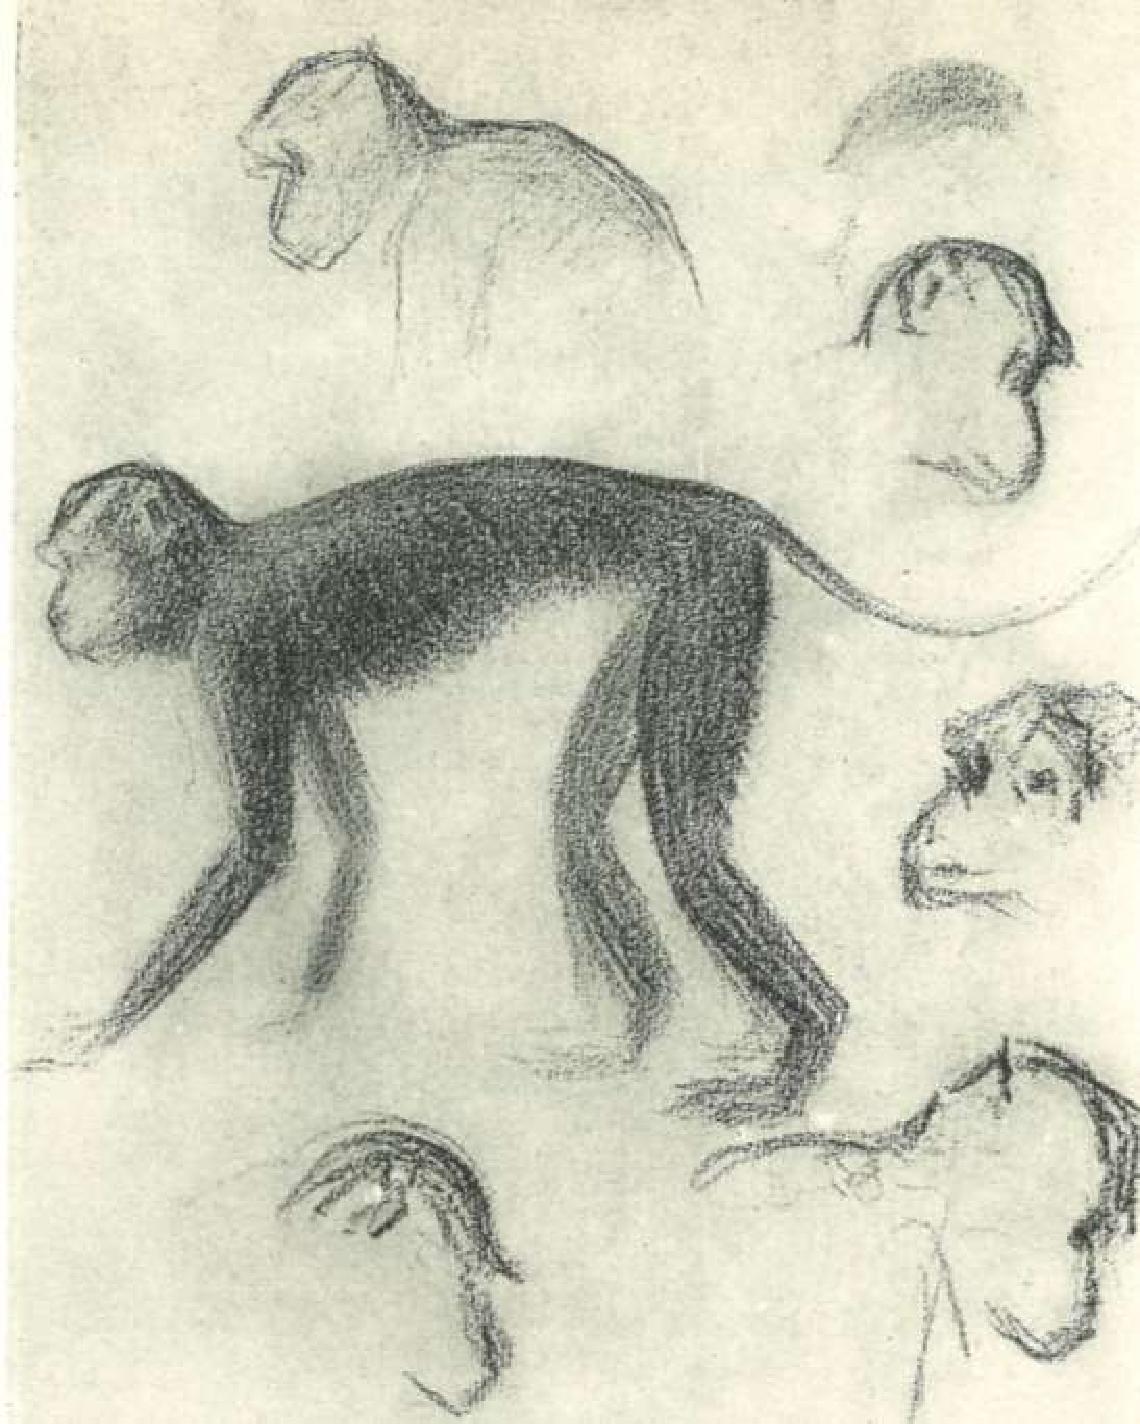 figure 2.40